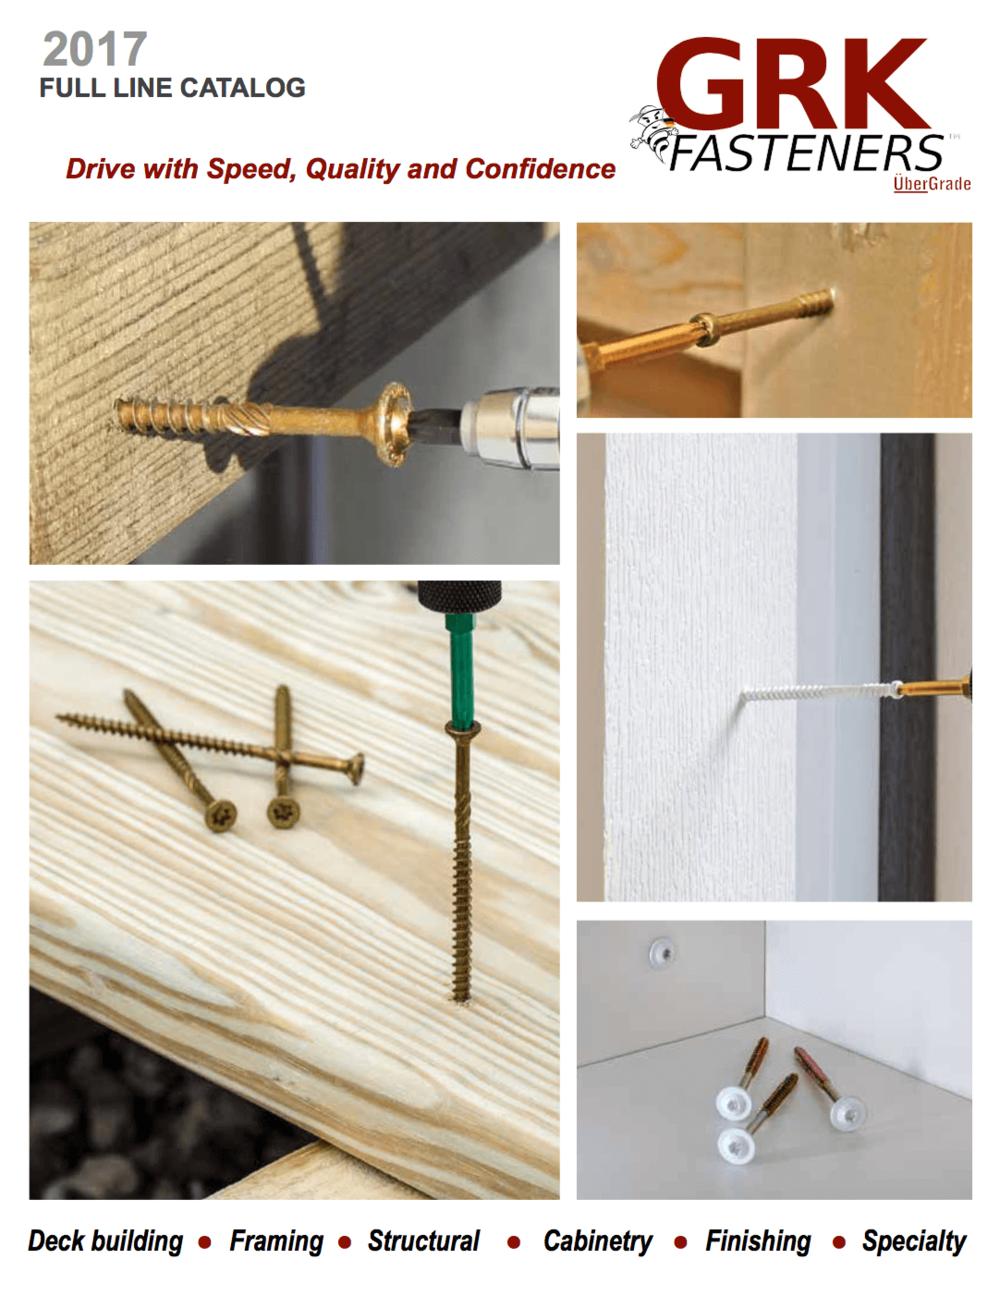 GRK Fasteners 2017 Catalog